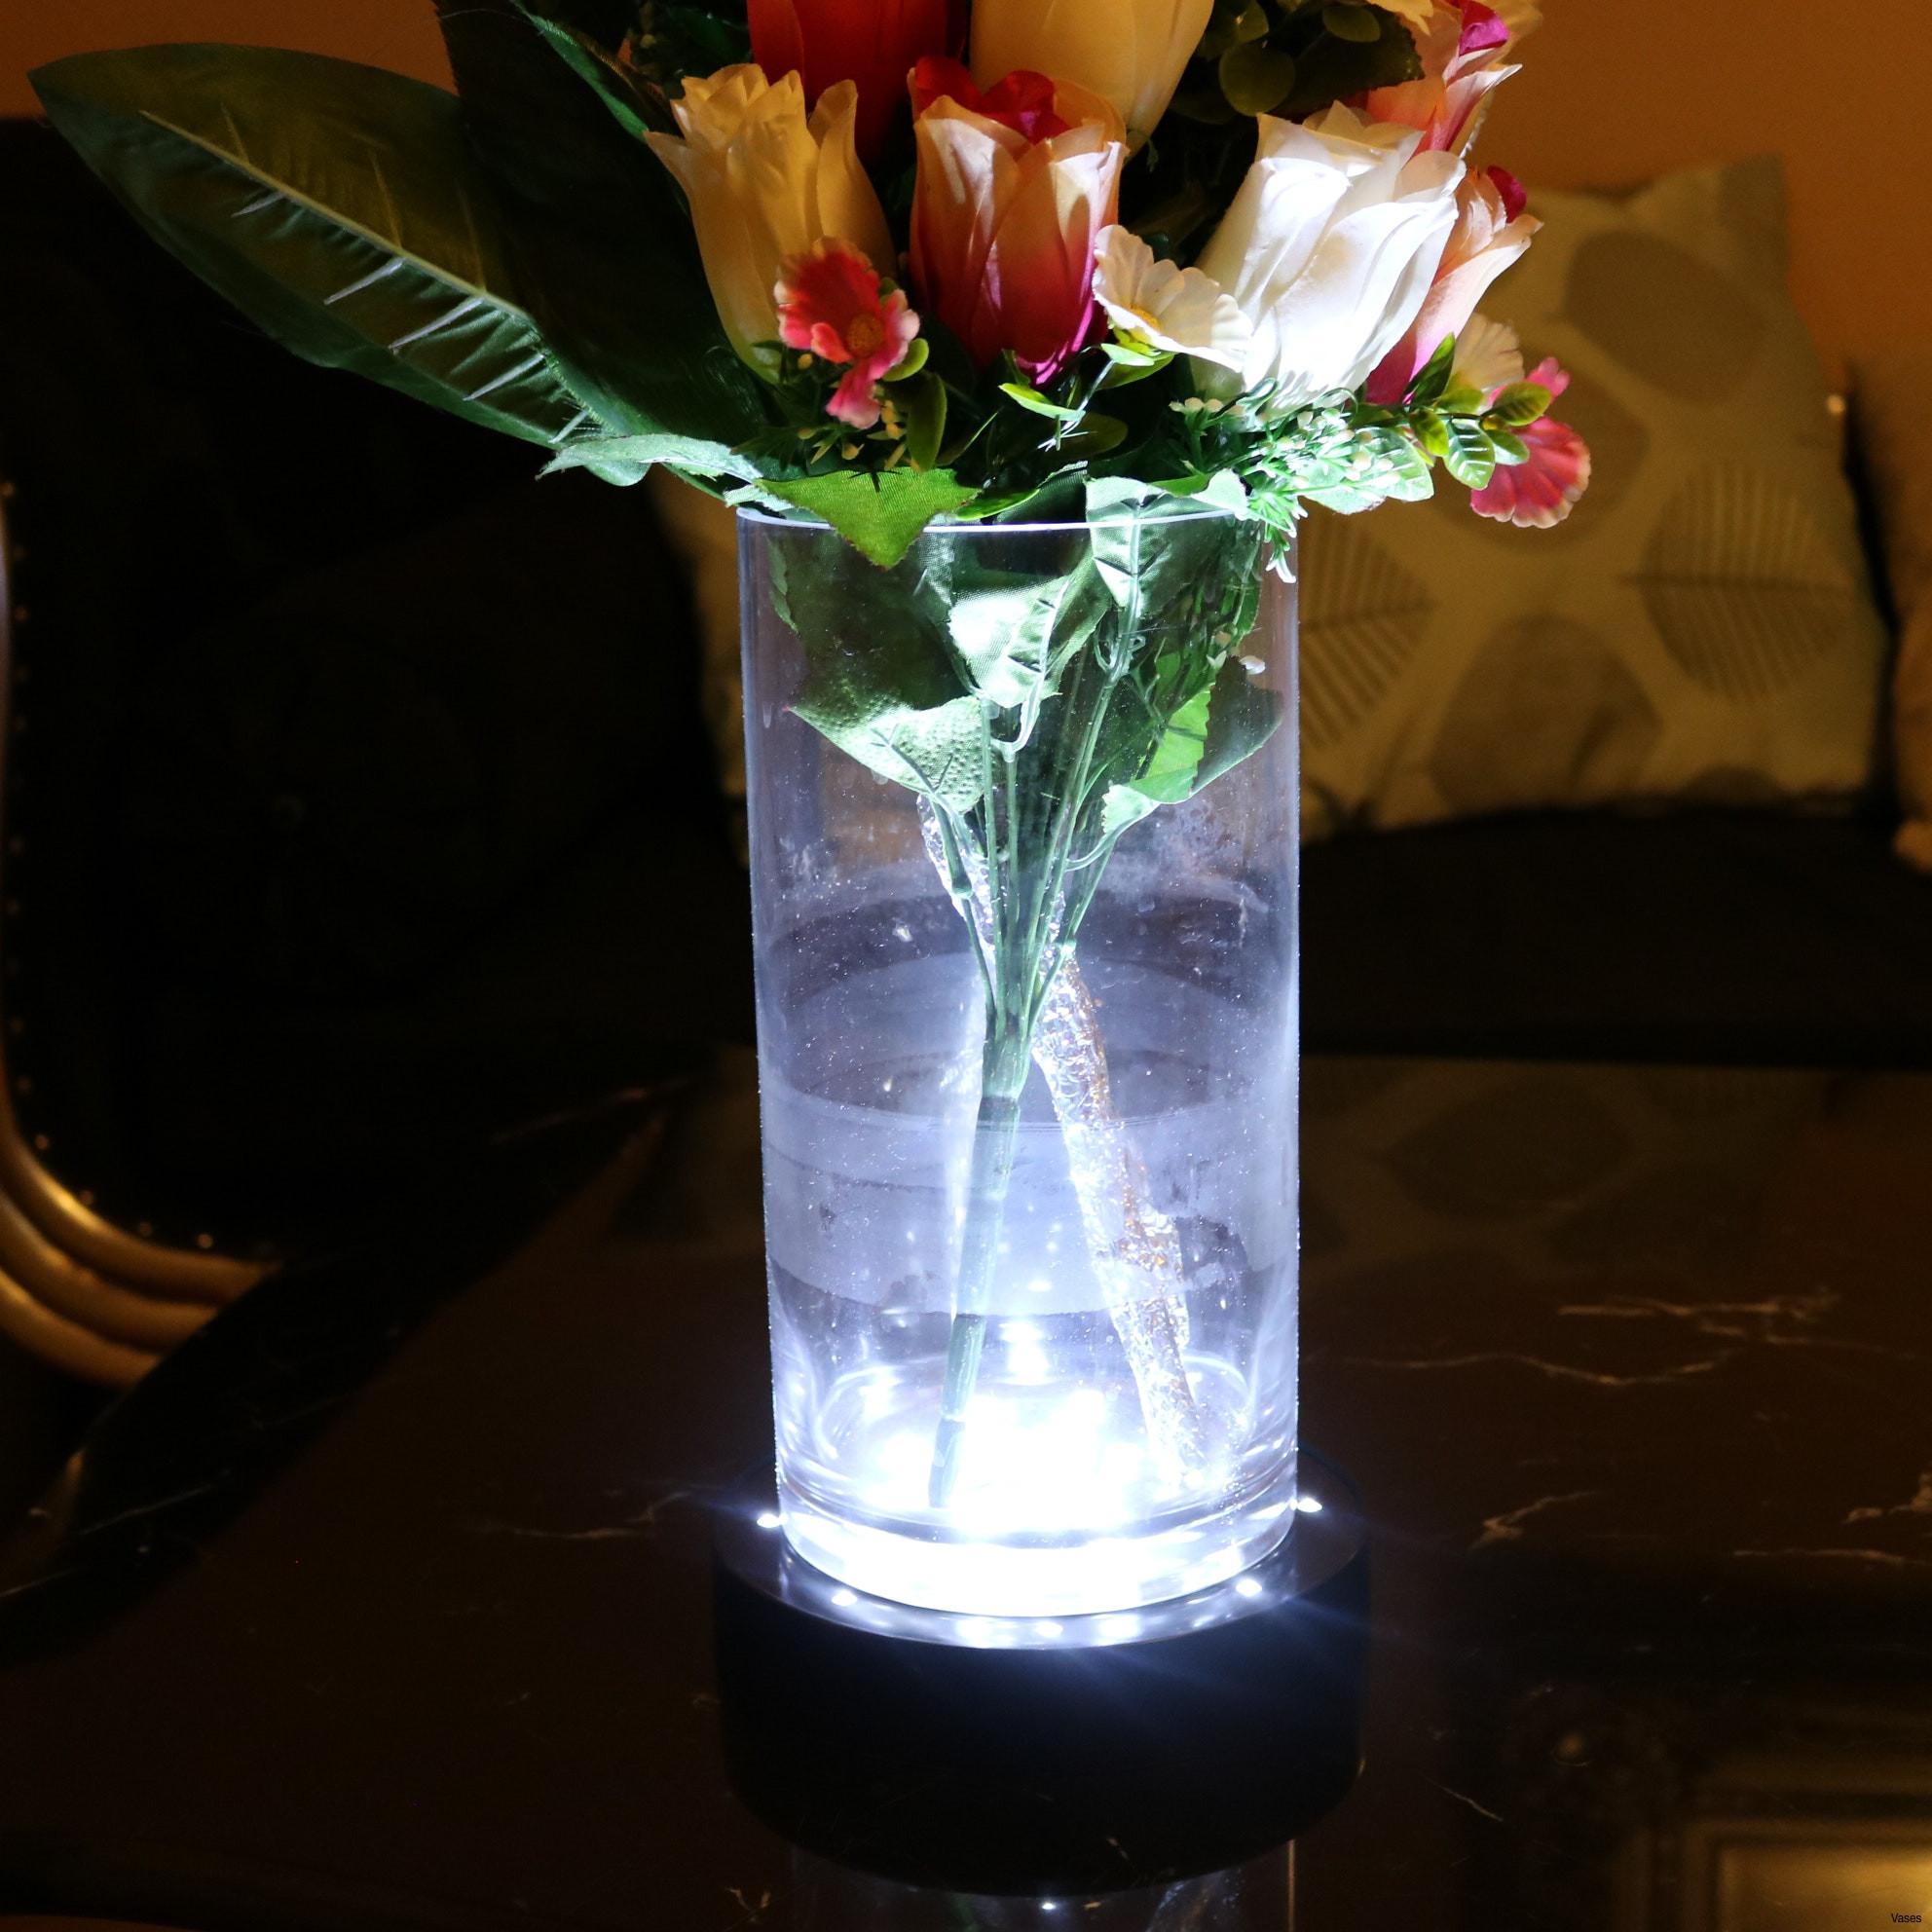 mikasa florale vase of plastic trumpet vase image vases disposable plastic single cheap with regard to plastic trumpet vase image vases disposable plastic single cheap flower rose vasei 0d d